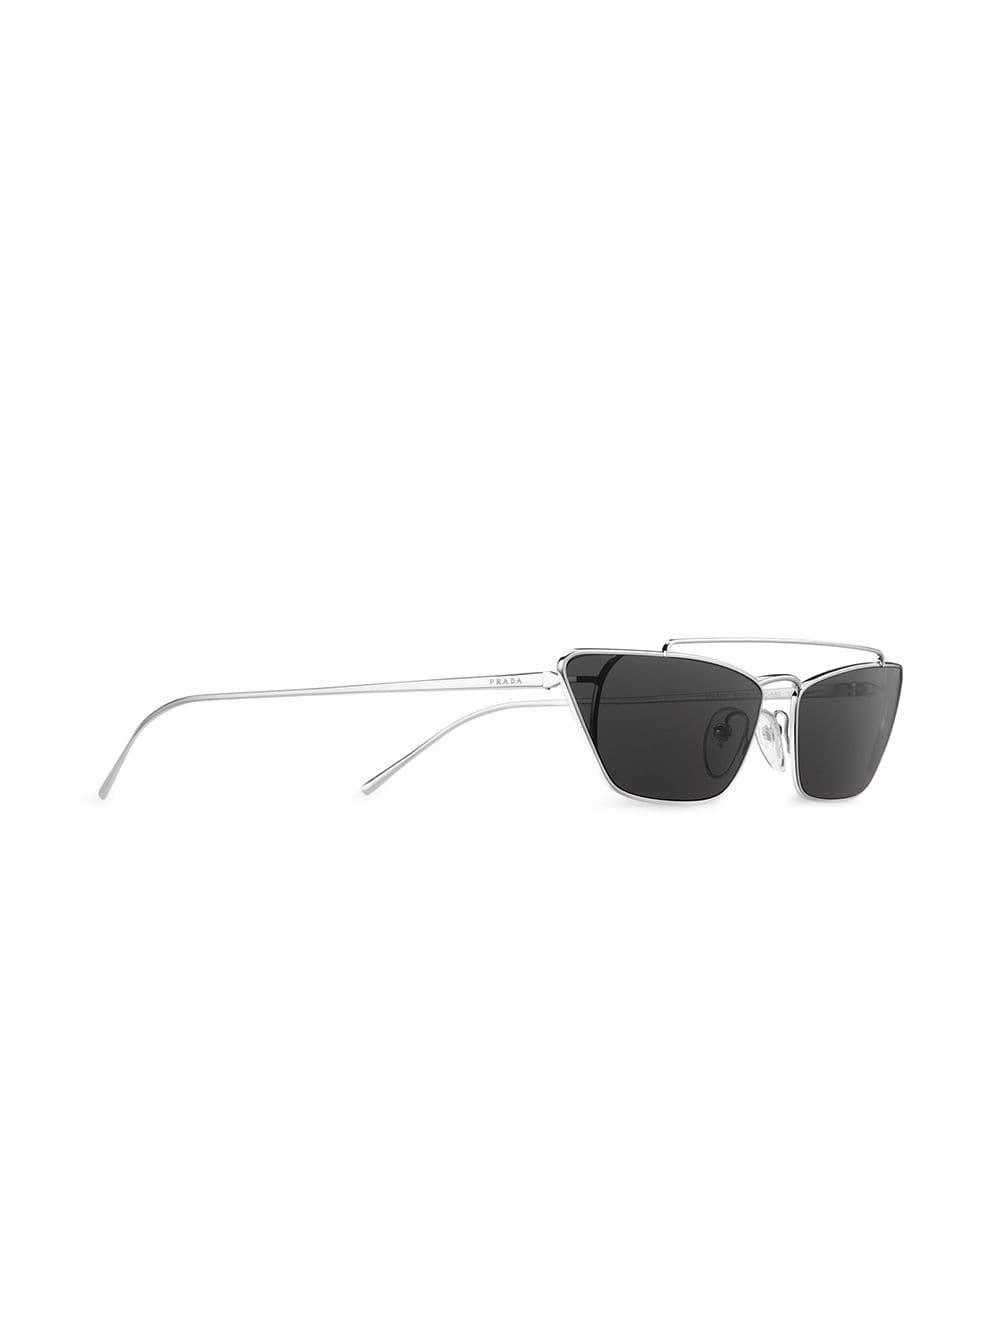 998fe0bf20 Prada Prada Ultravox Sunglasses in Metallic - Save 9.090909090909093% - Lyst